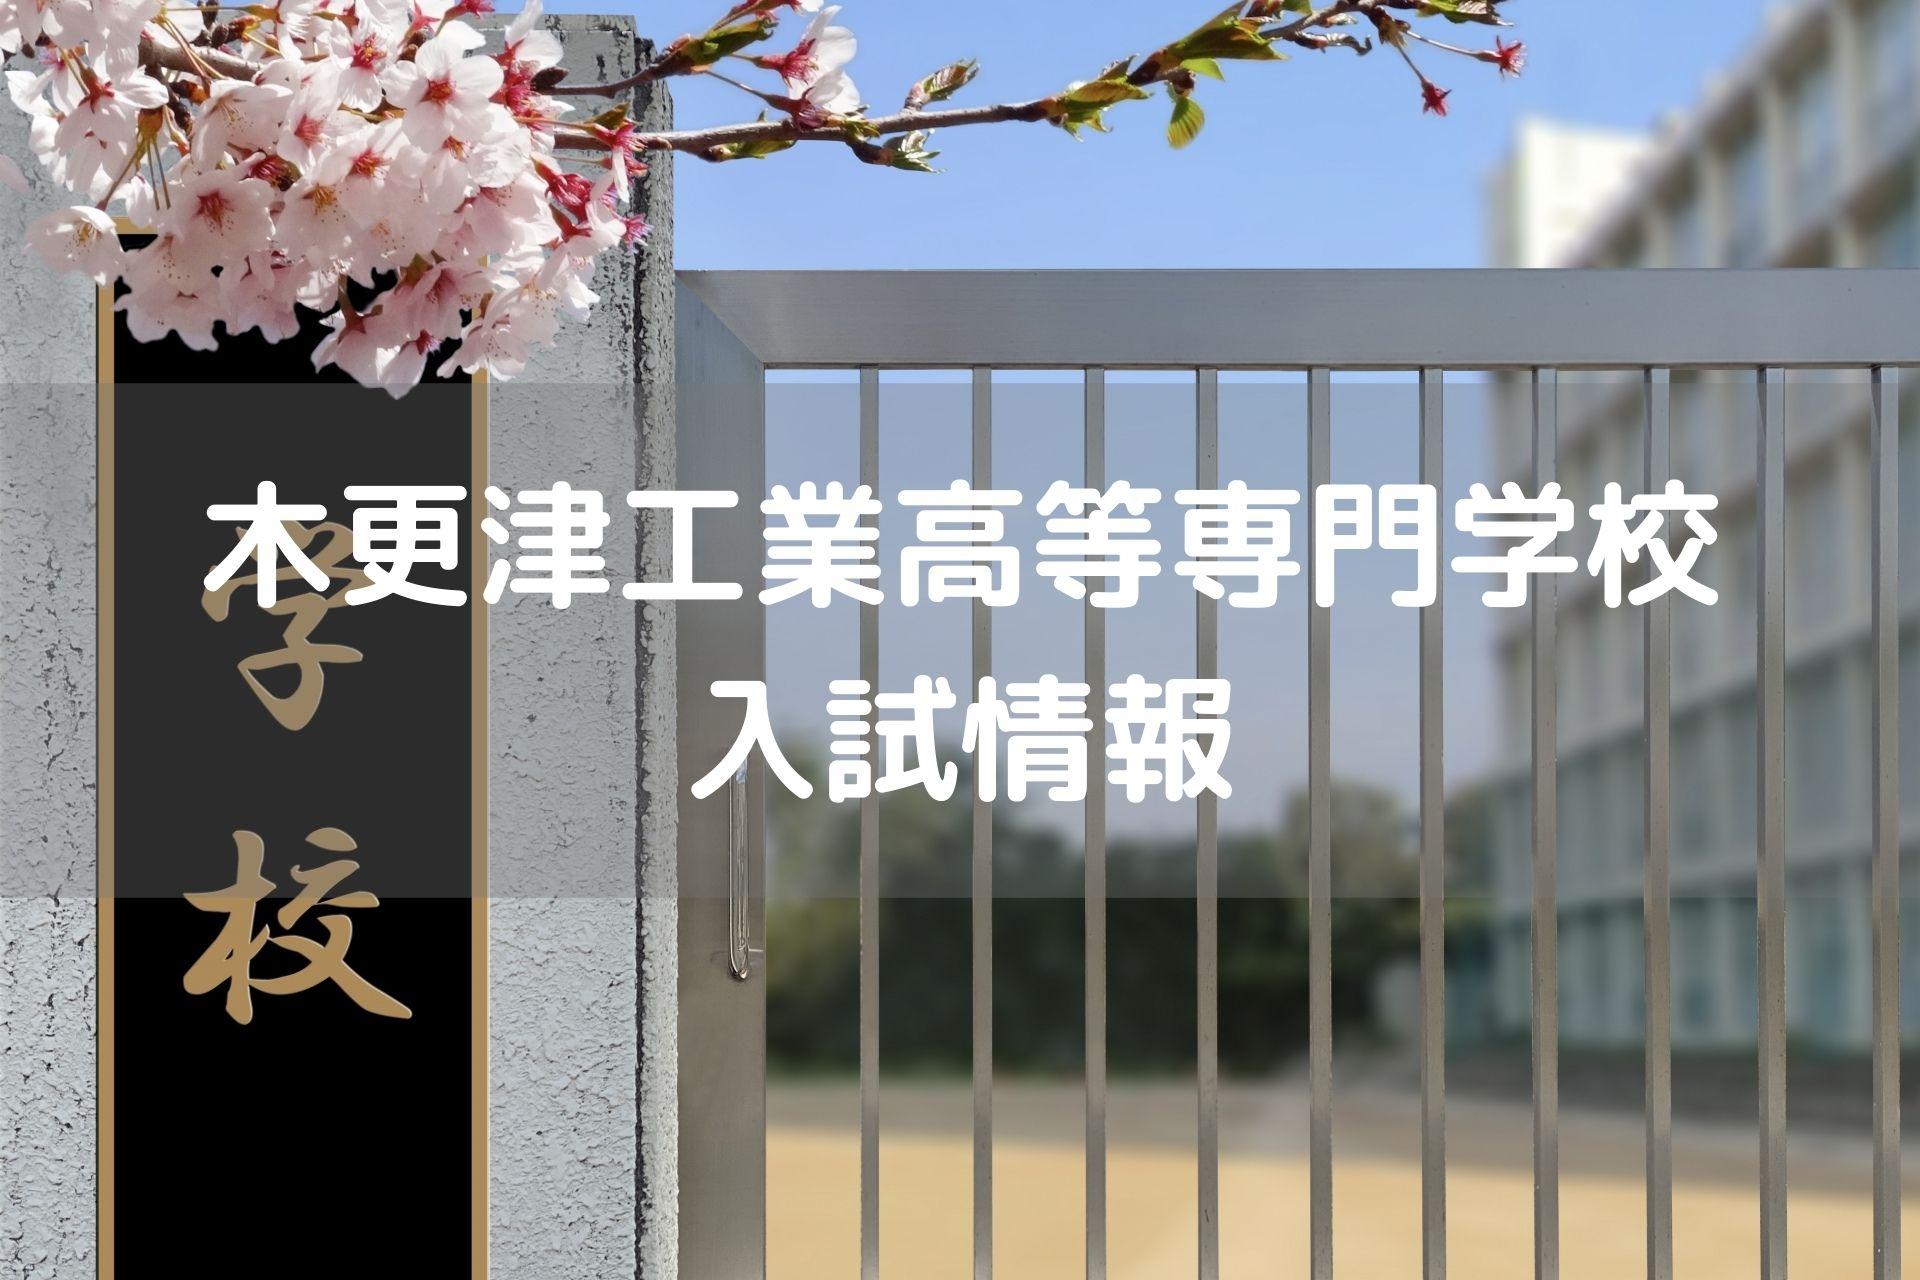 木更津高専の入試情報